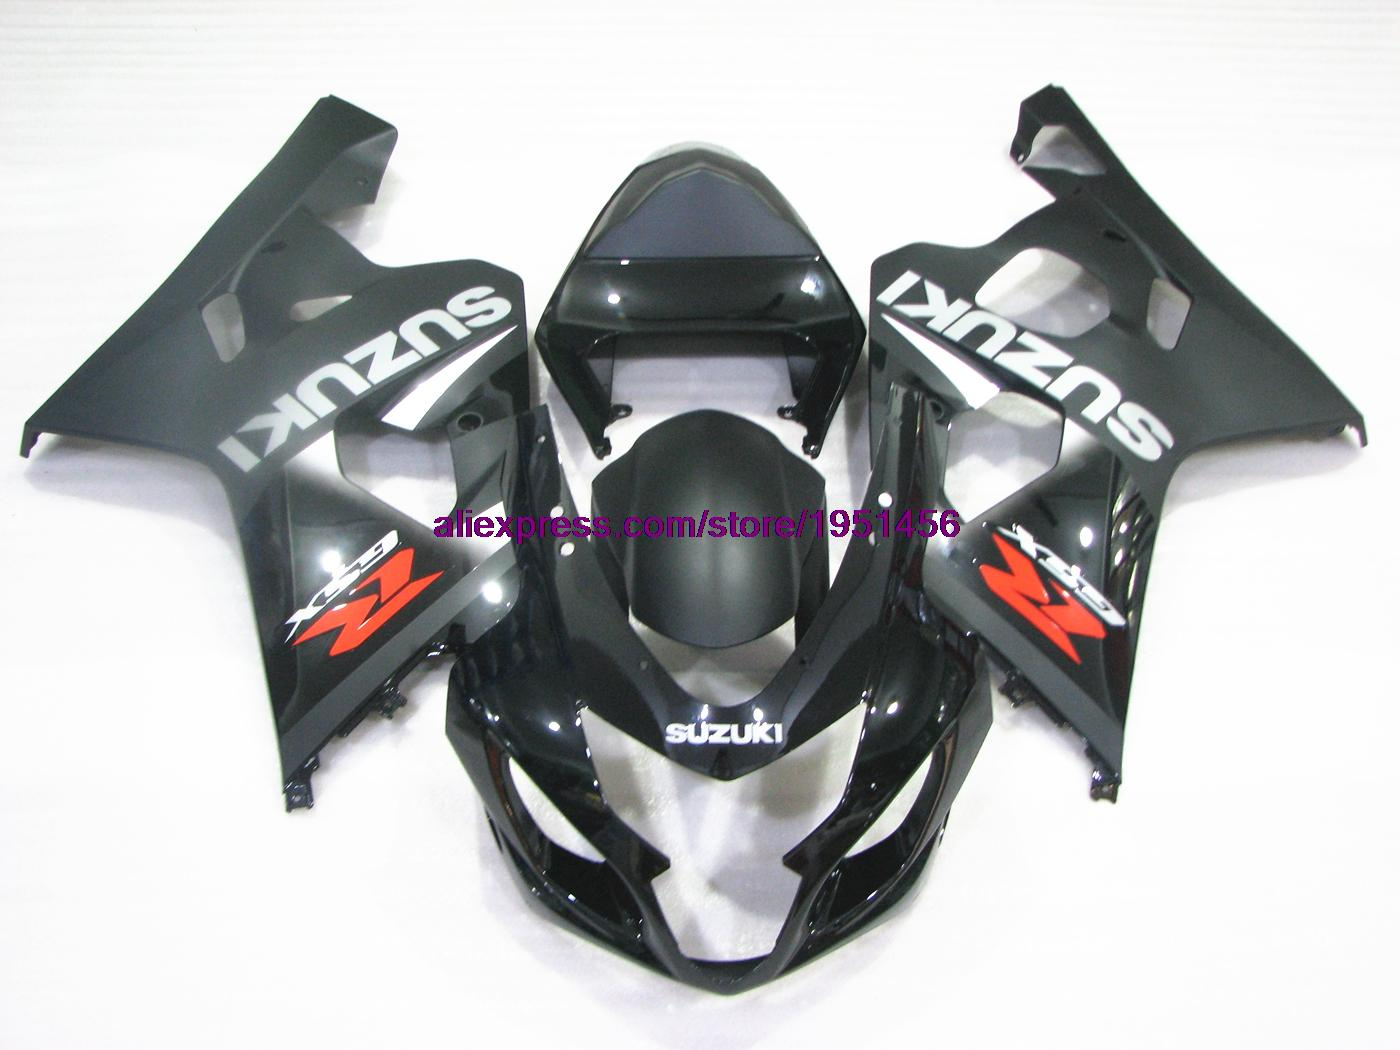 Motorcycle gloves gsxr - Gsxr 600 2004 2005 K4 05 Fairing Matter Black Glossy Black Injection Gsxr600 2005 Motorcycle